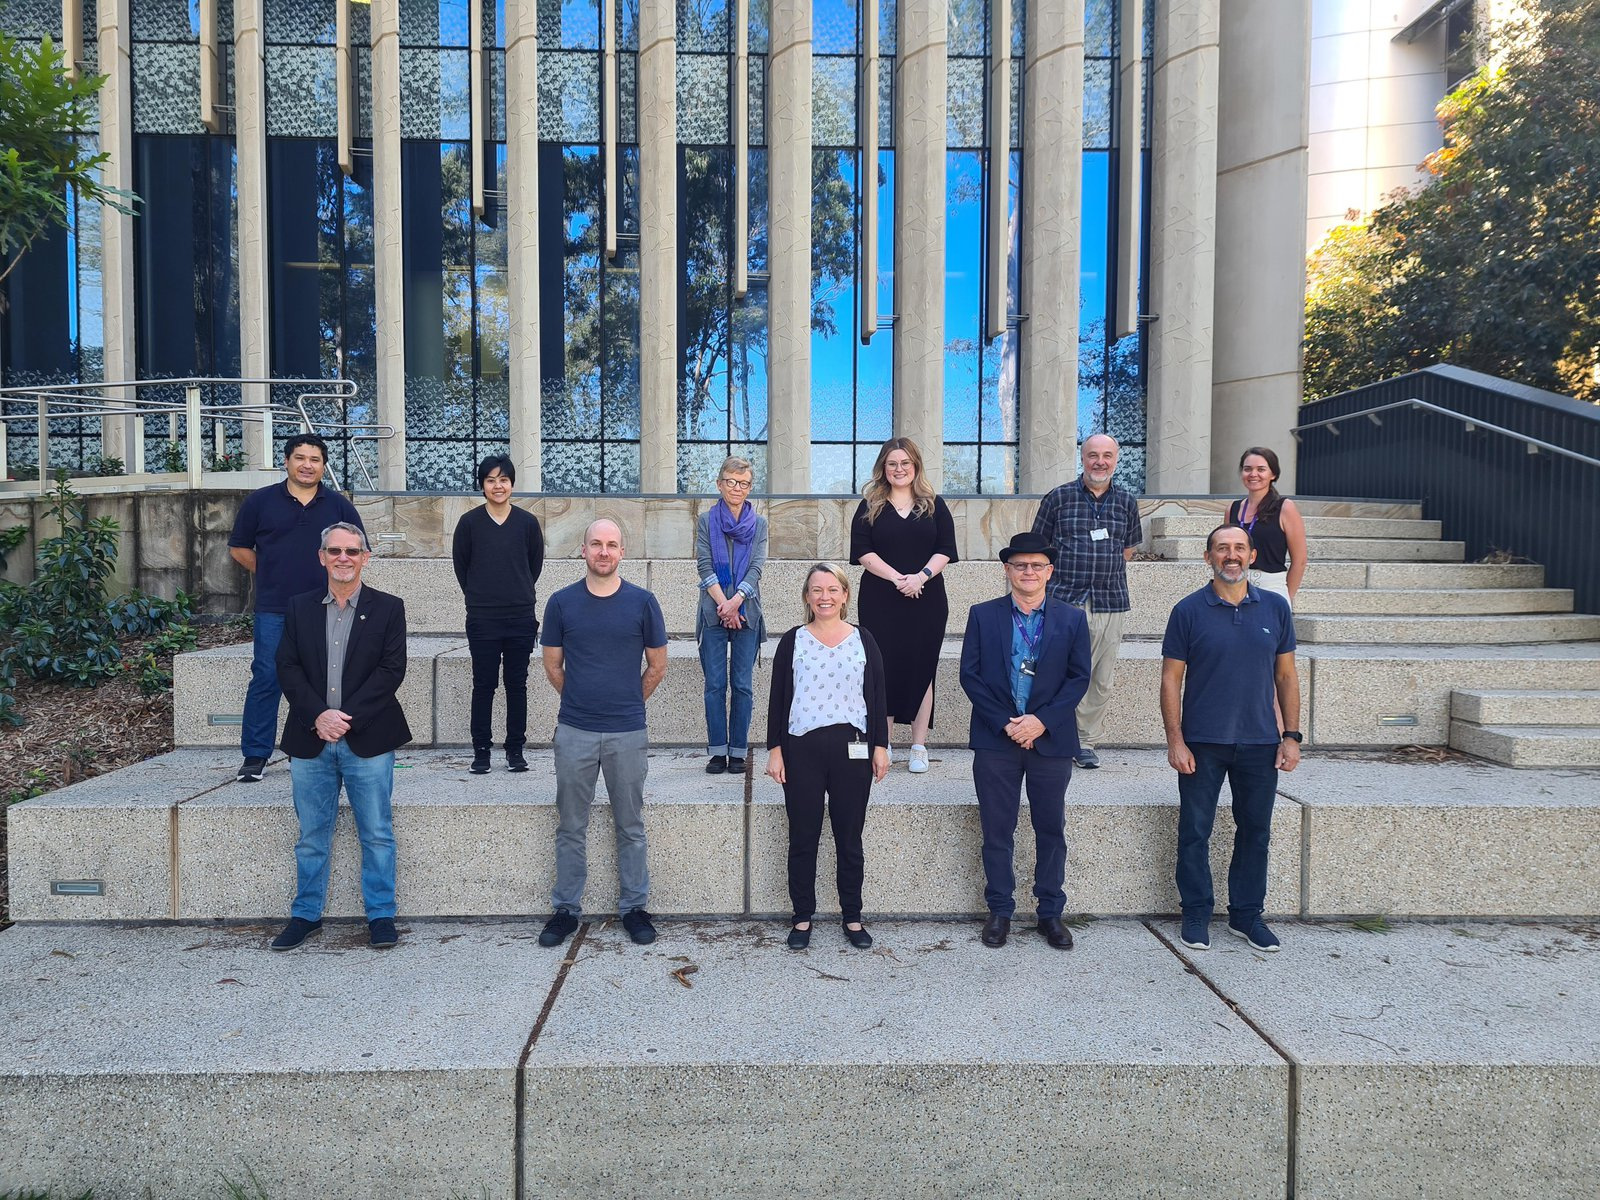 Team Chimera - Finalist, 2021 ANSTO Eureka Prize for Innovative Use of Technology